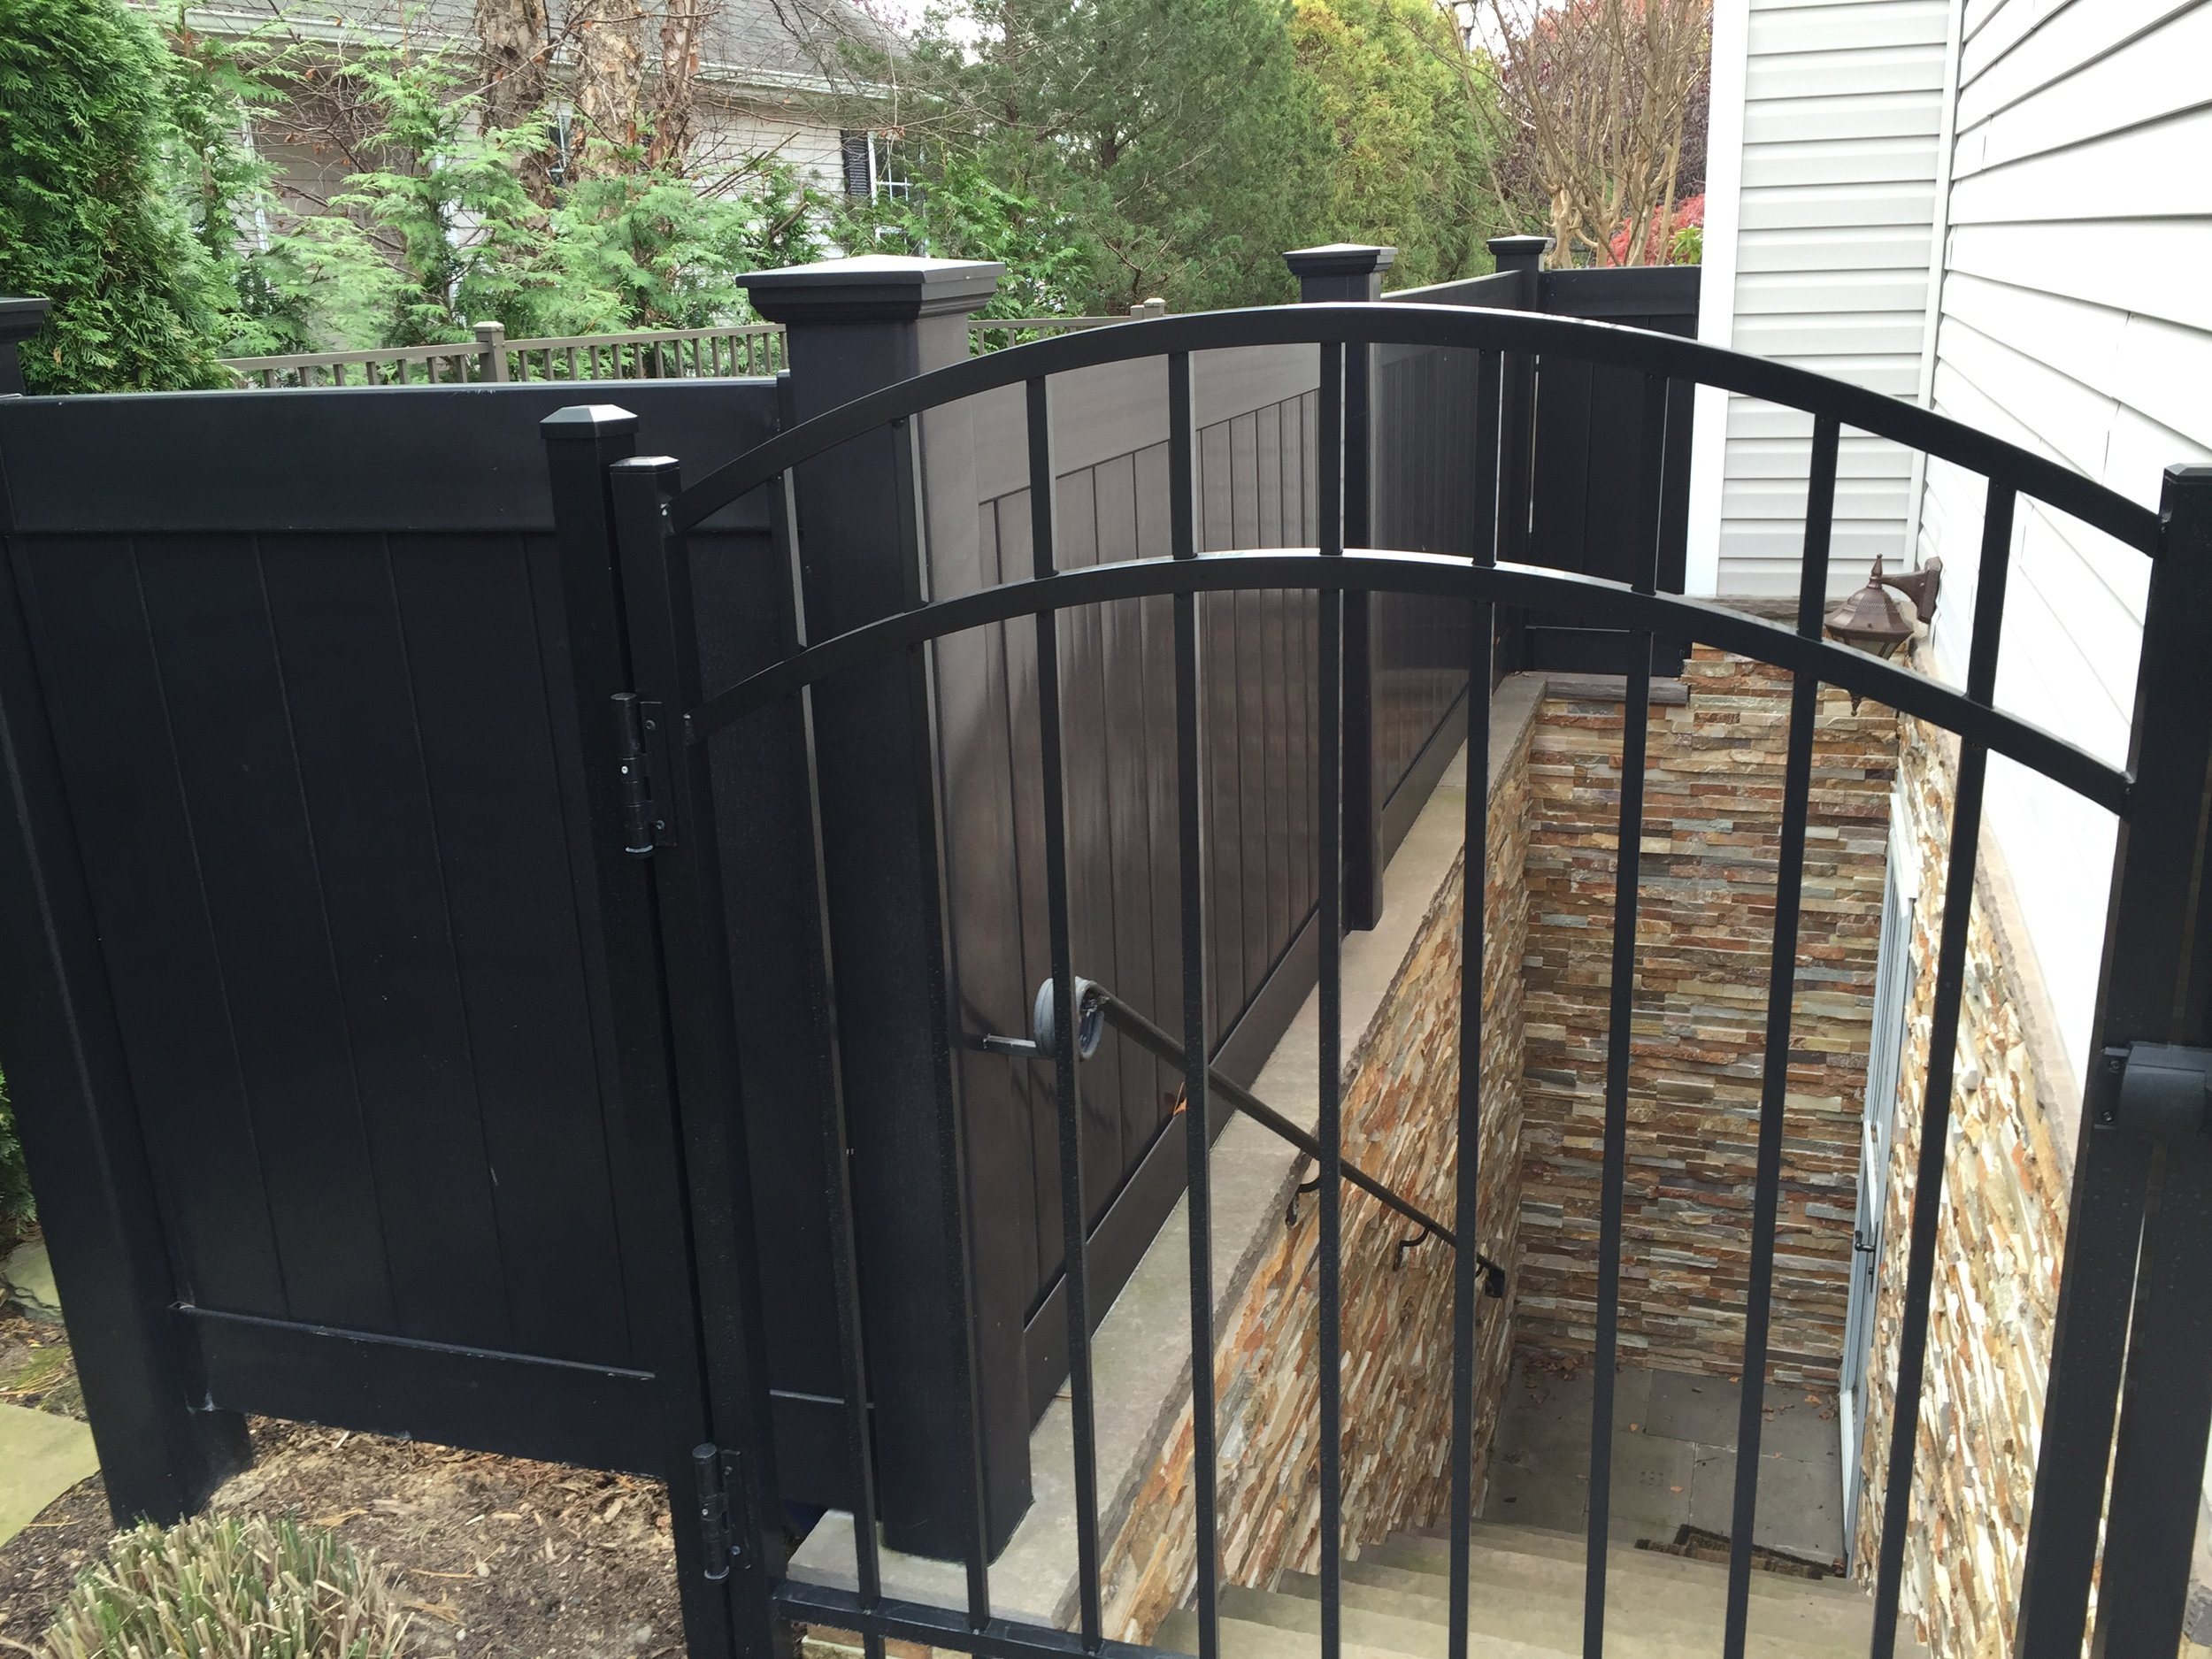 Experienced aluminum fence landscape design company in Long Island, NY